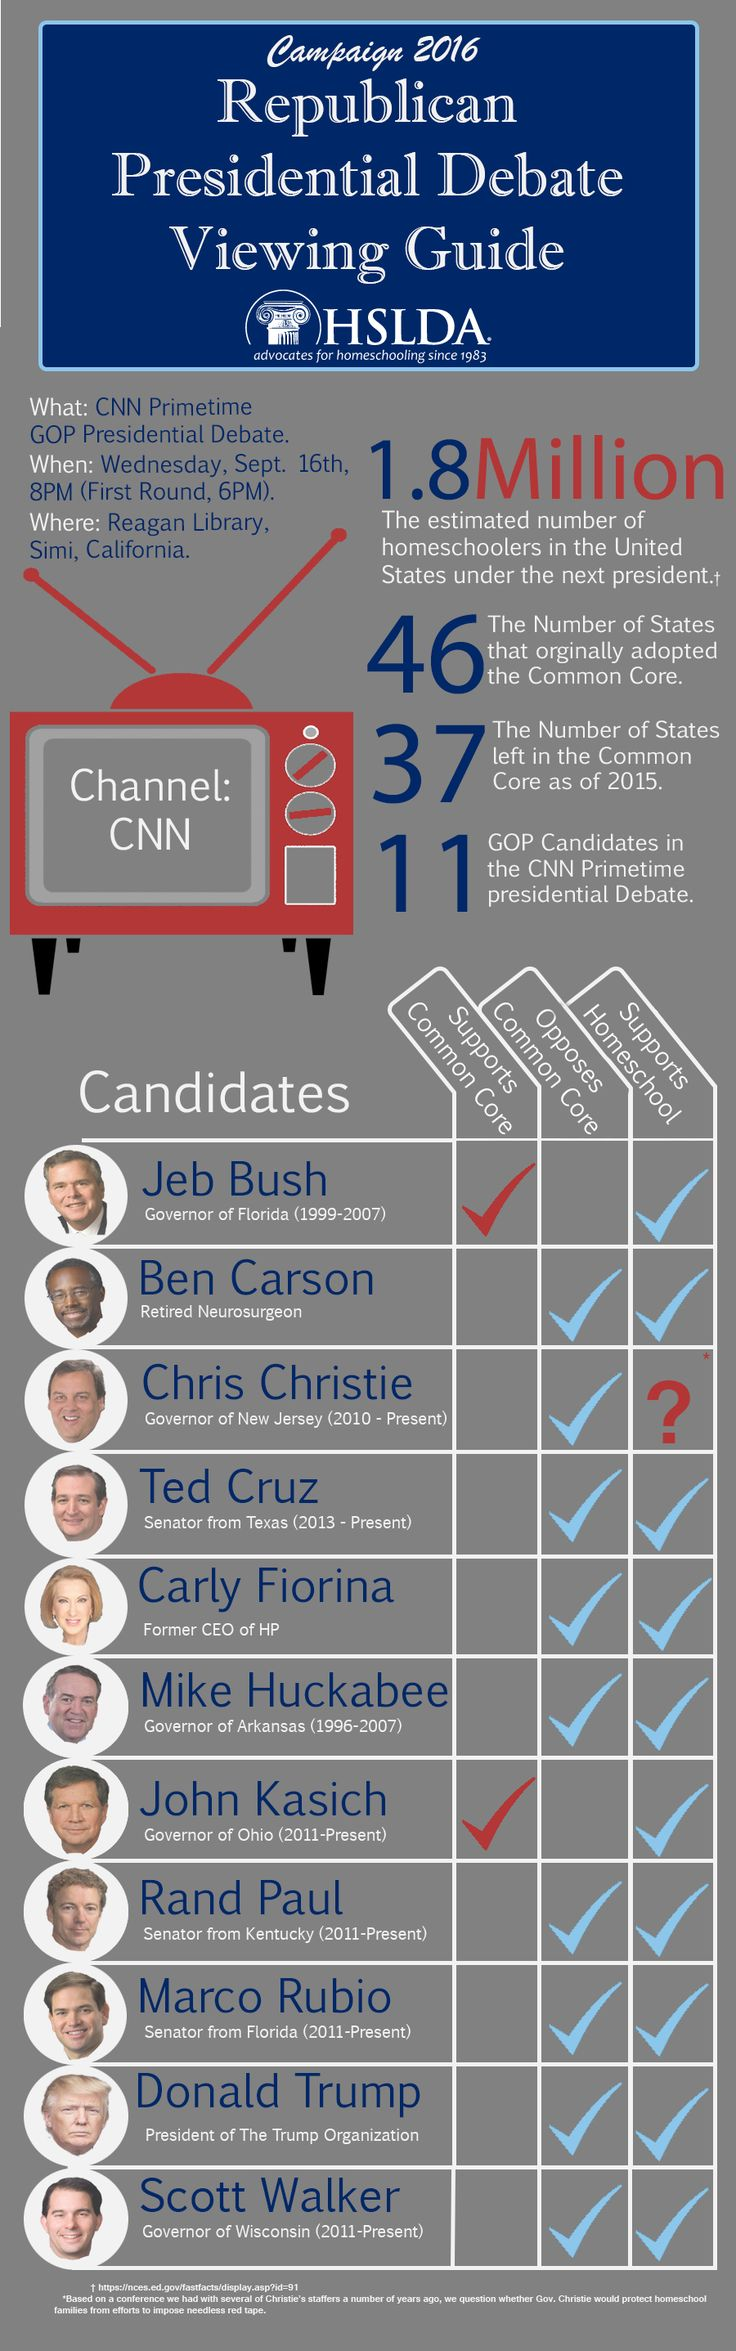 Republican Presidential Debate Viewing Guide   HSLDA Blog